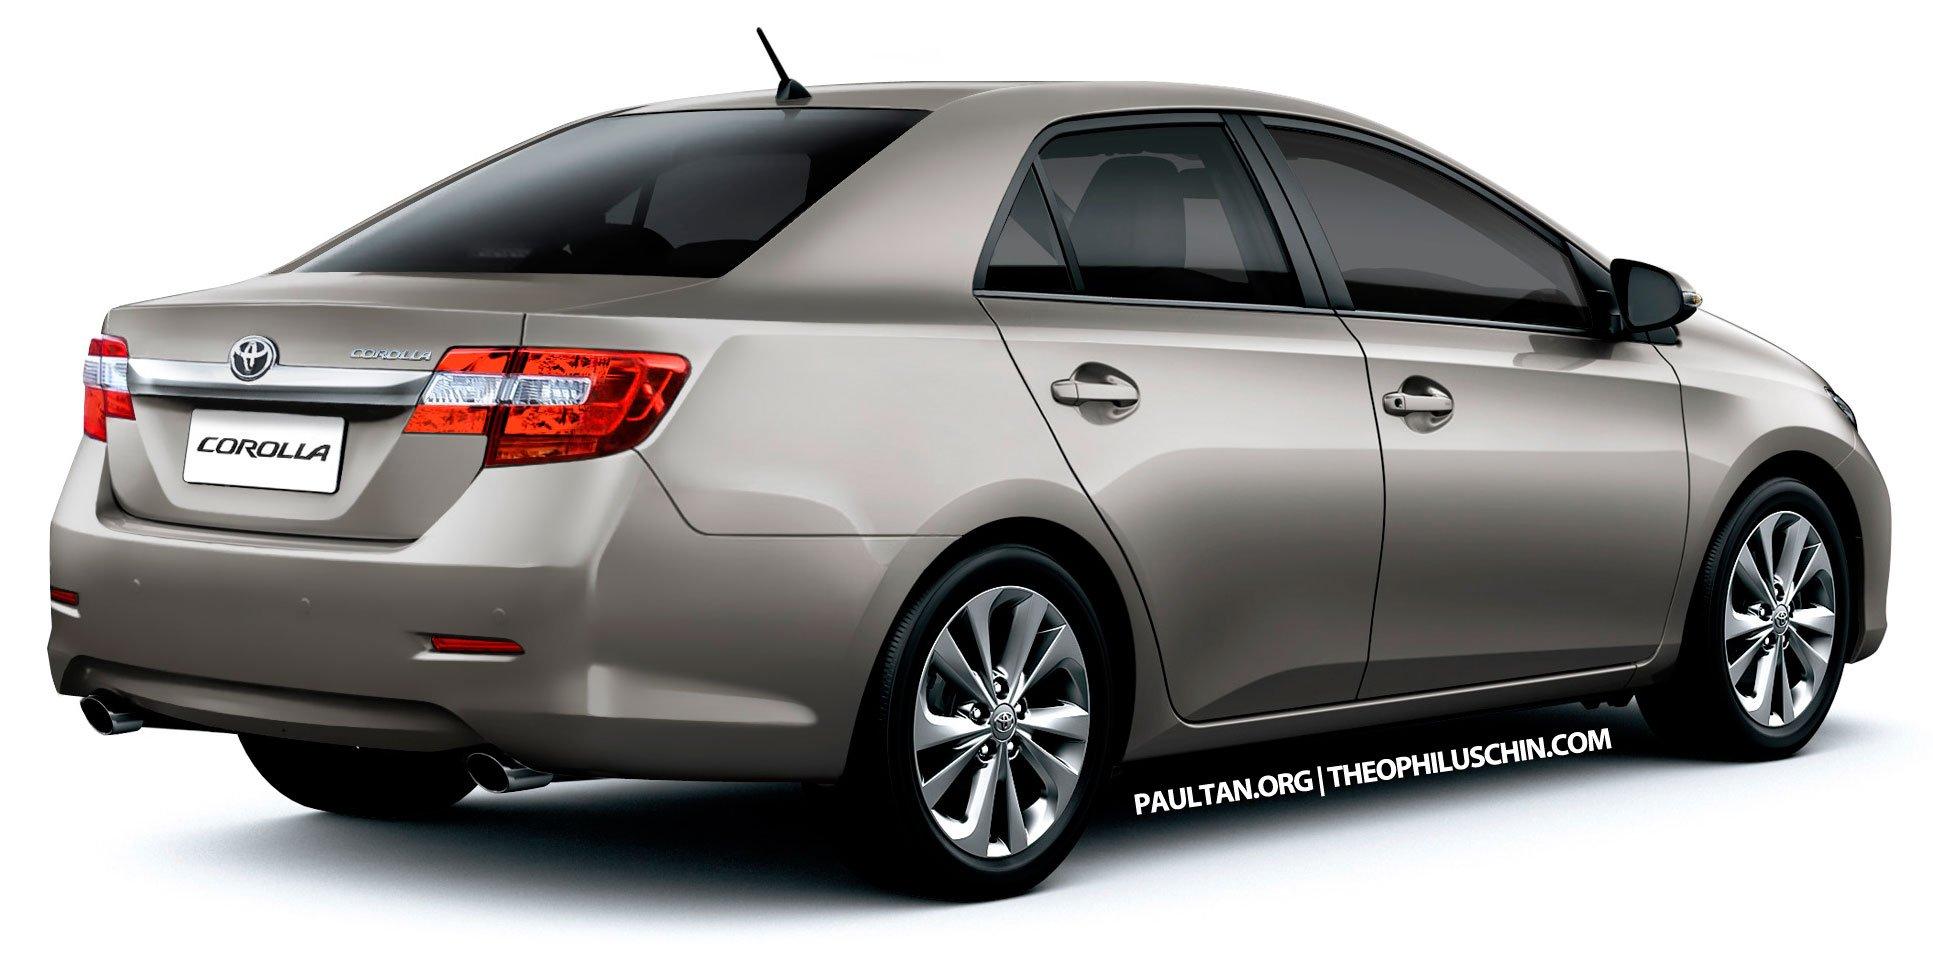 new toyota corolla altis sedan to debut in 2013. Black Bedroom Furniture Sets. Home Design Ideas